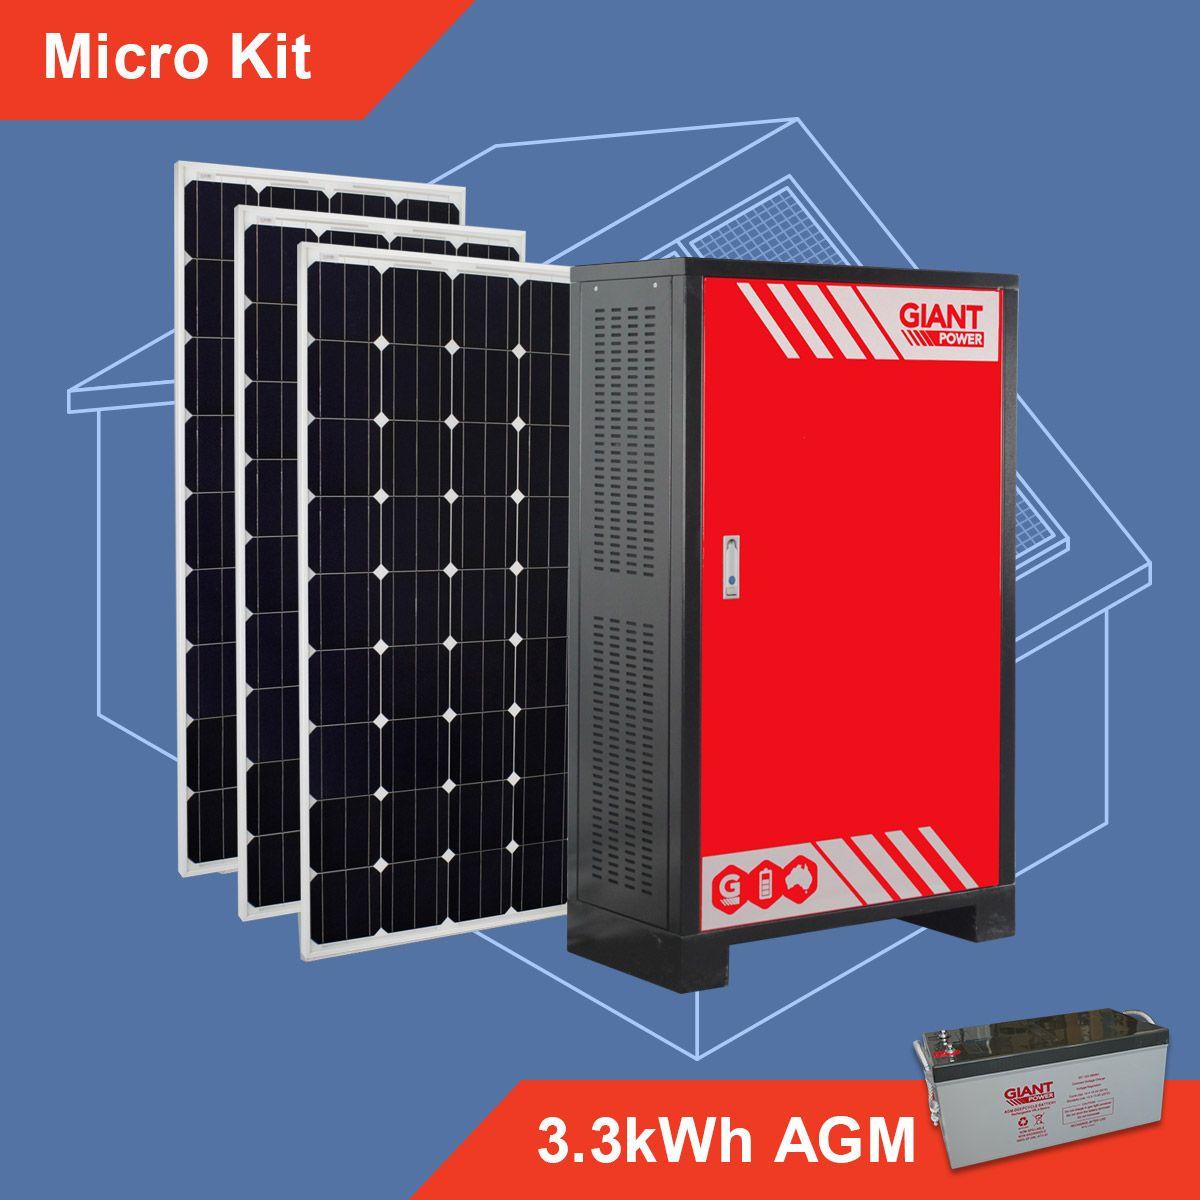 7 2kwh 12v 600ah Giant Power Agm Battery Bank 12v Cells Solar System Kit Off Grid Solar Off Grid System